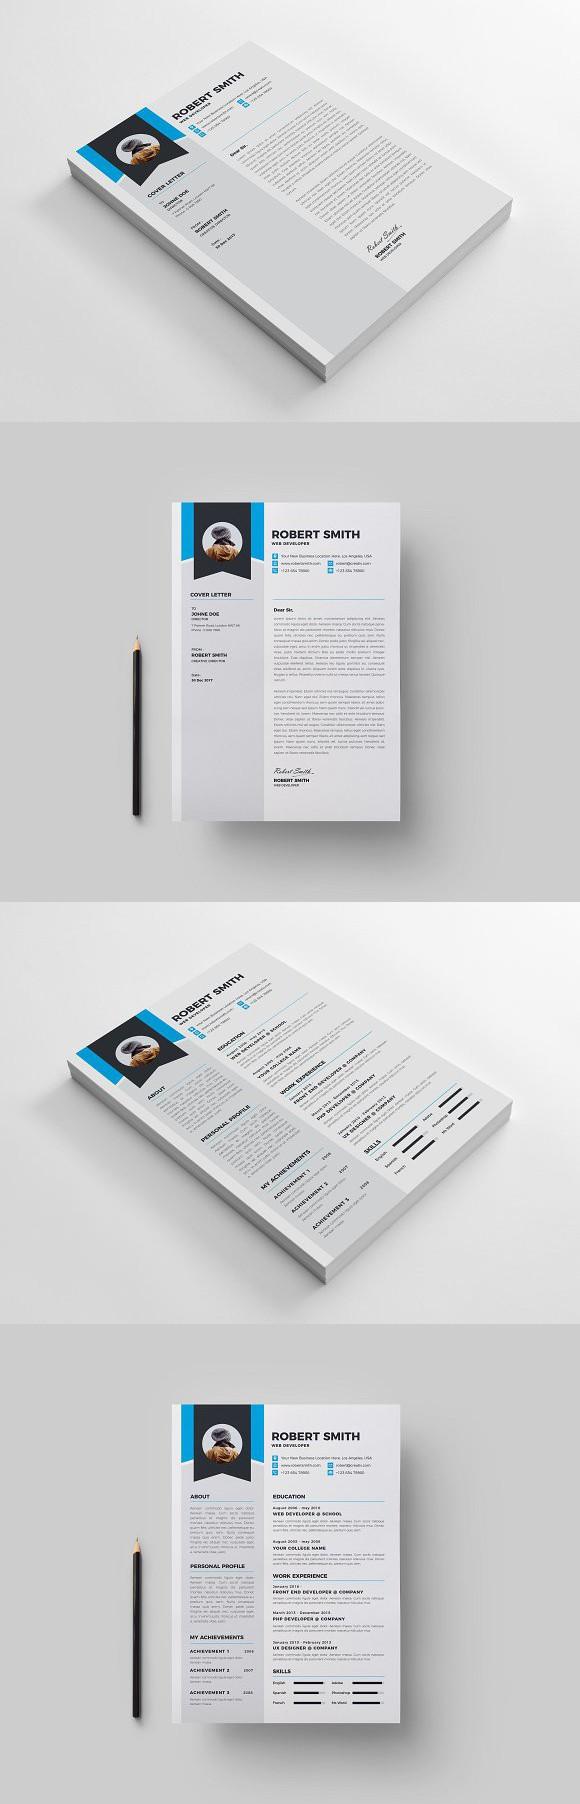 Resume / CV. Perfect Resume Simple resume template